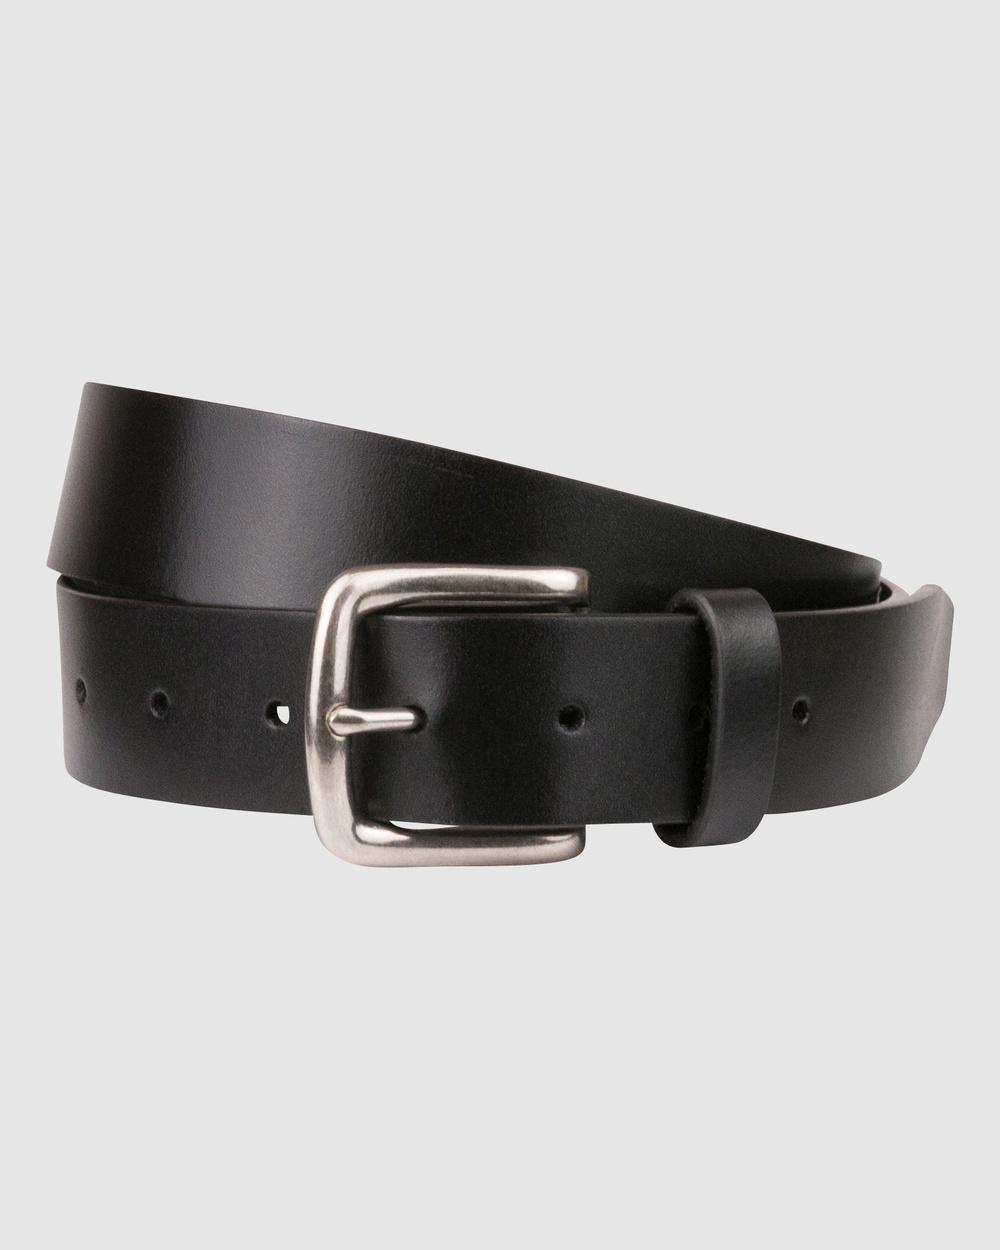 Florsheim Pacino Belt Belts Black